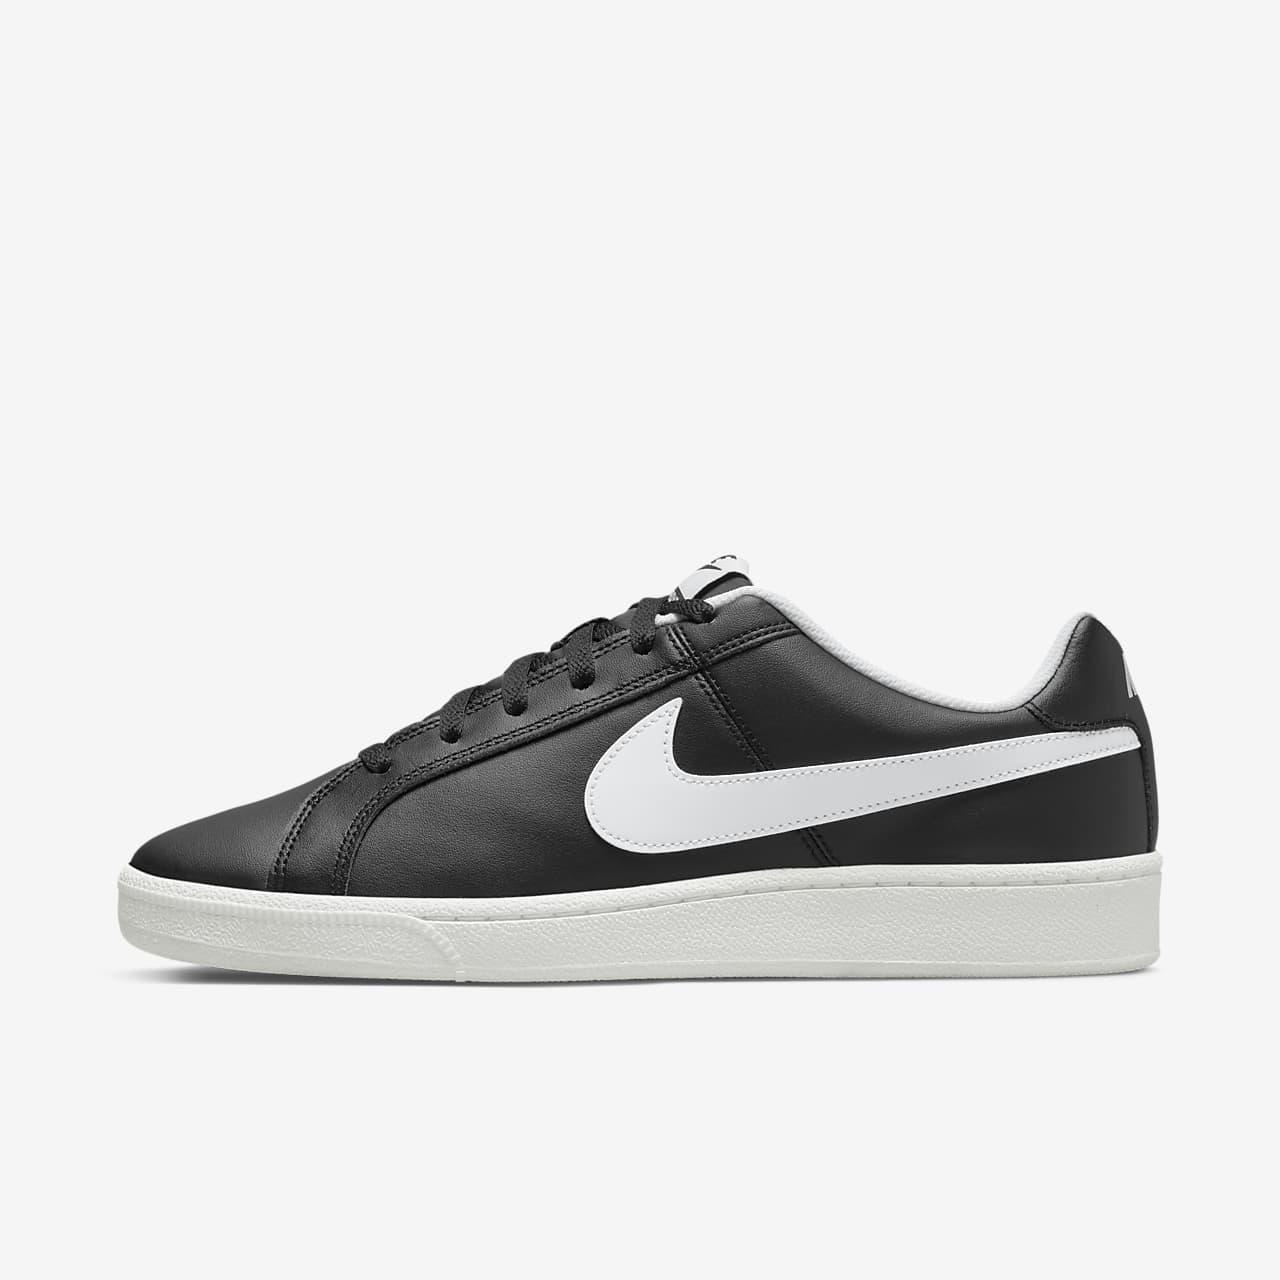 Tenis Nike Court Royale Zapatilla Hombre 749747 140